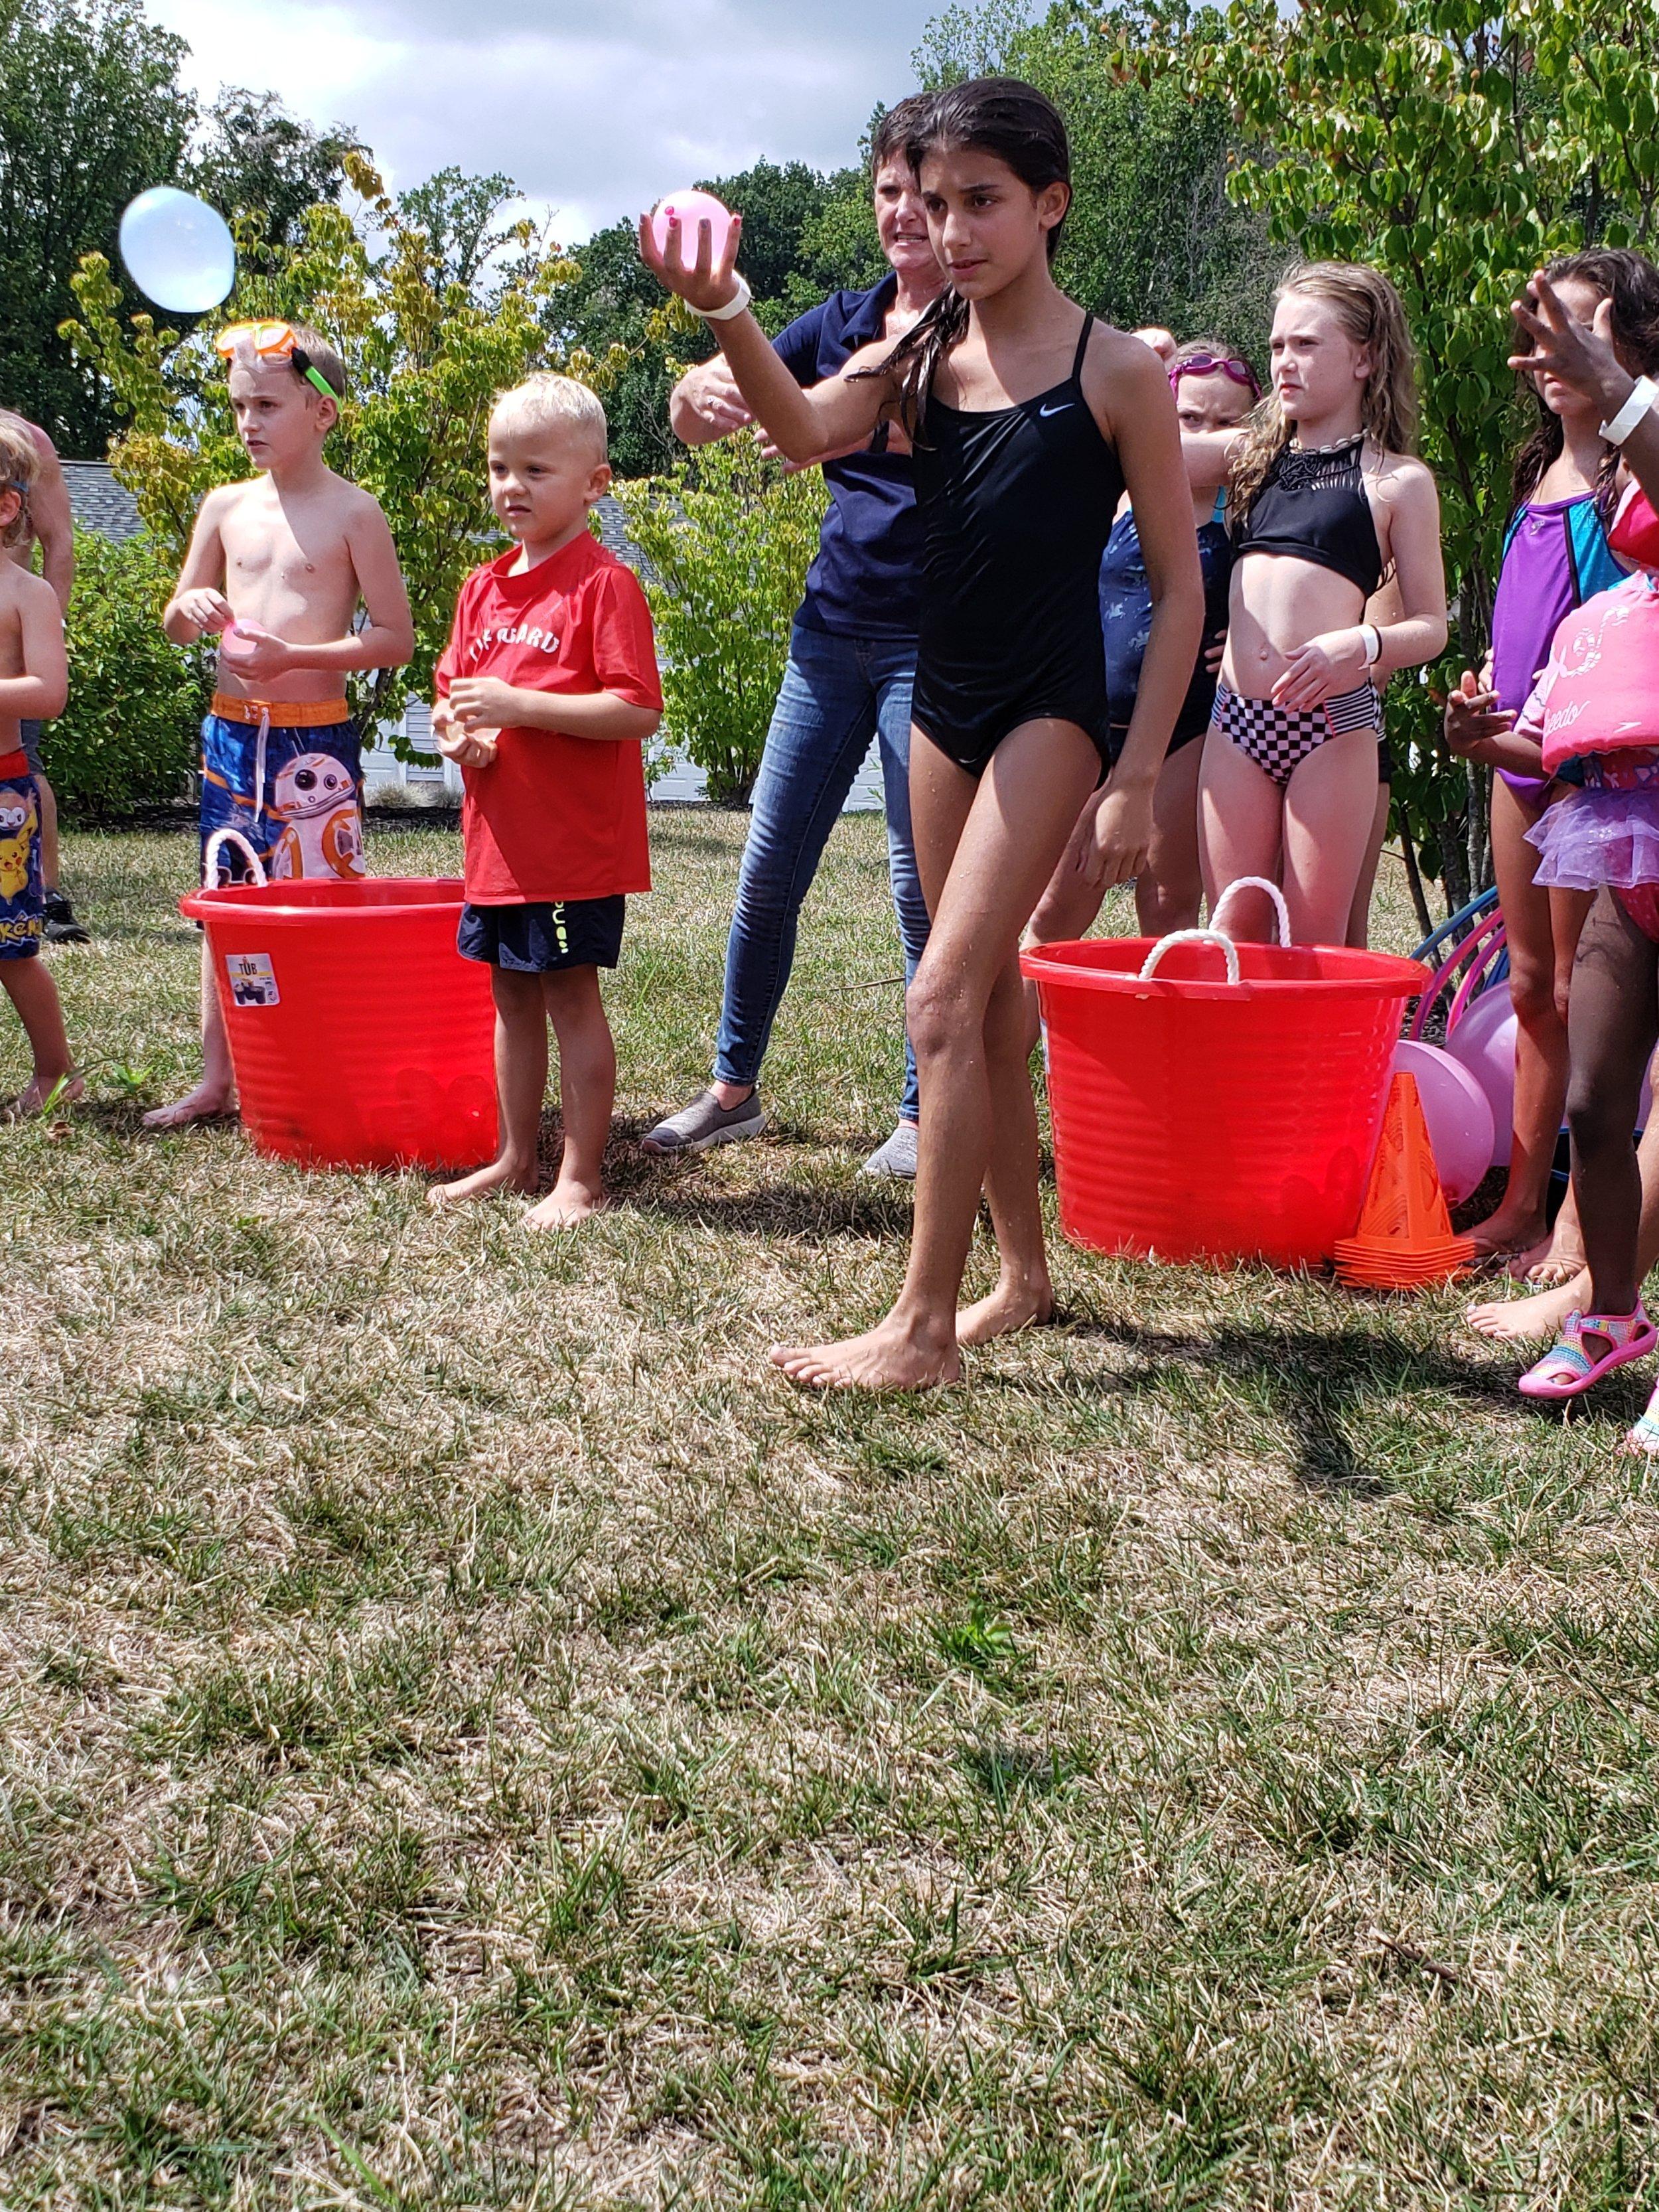 2019 Avanti Apartments Pool Party - Water Balloon Fight